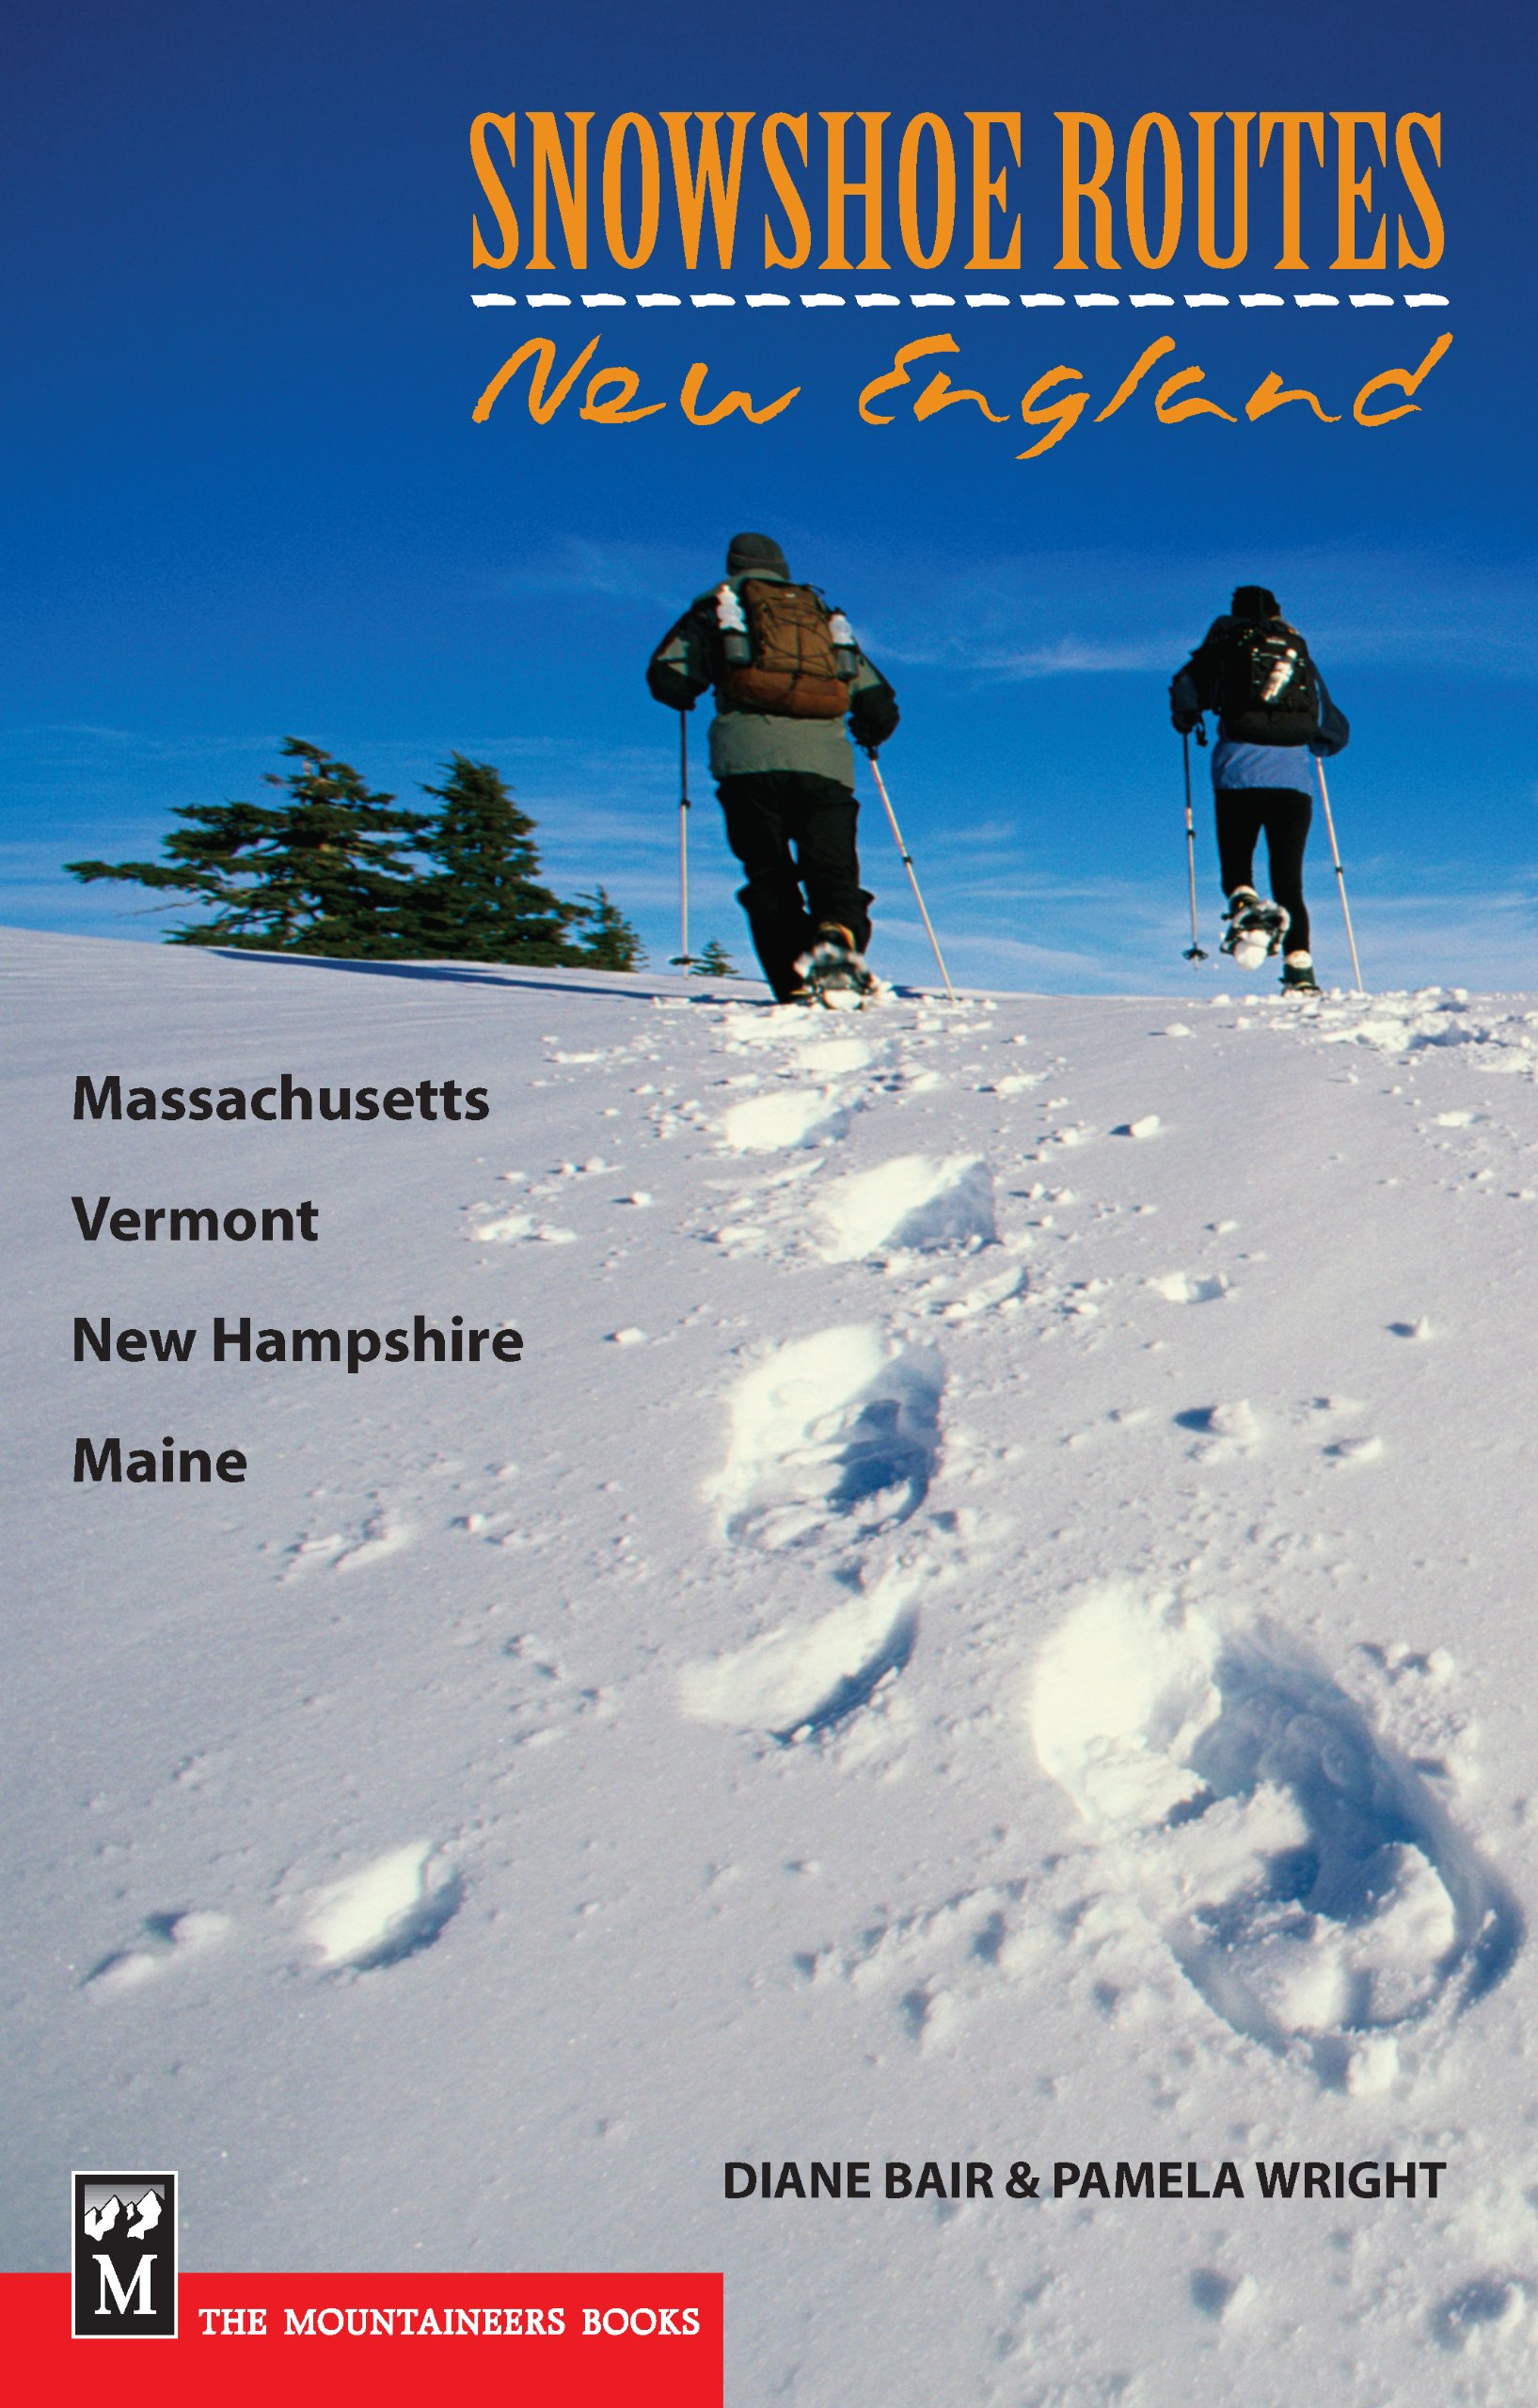 Read Online Snowshoe Routes: New England - Massachusetts, Vermont, New Hampshire, Maine PDF